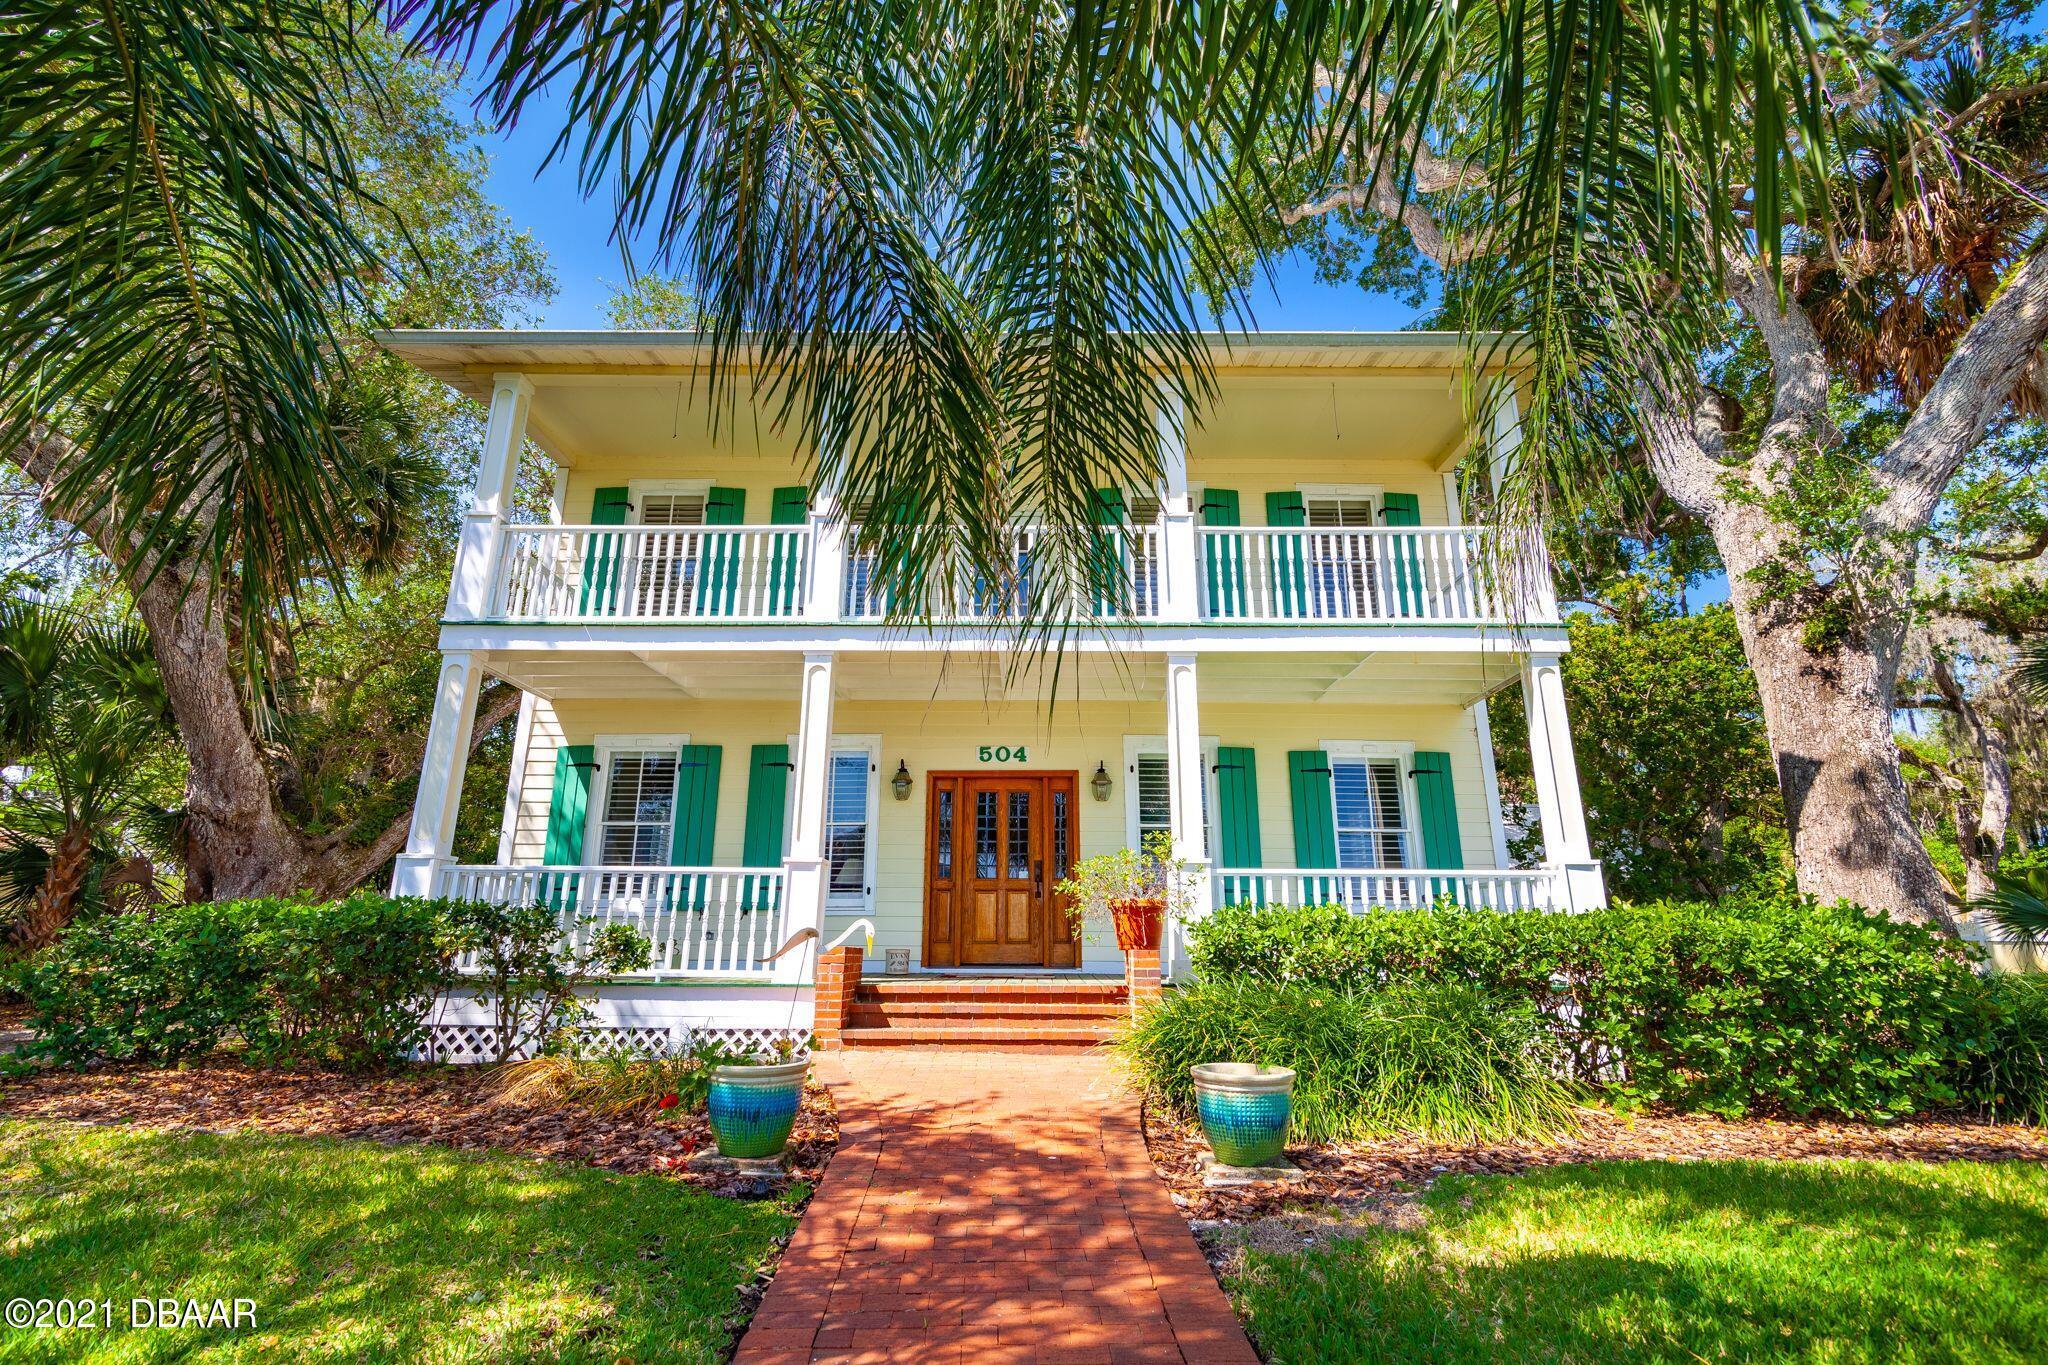 Photo of 504 N Riverside Drive, New Smyrna Beach, FL 32168